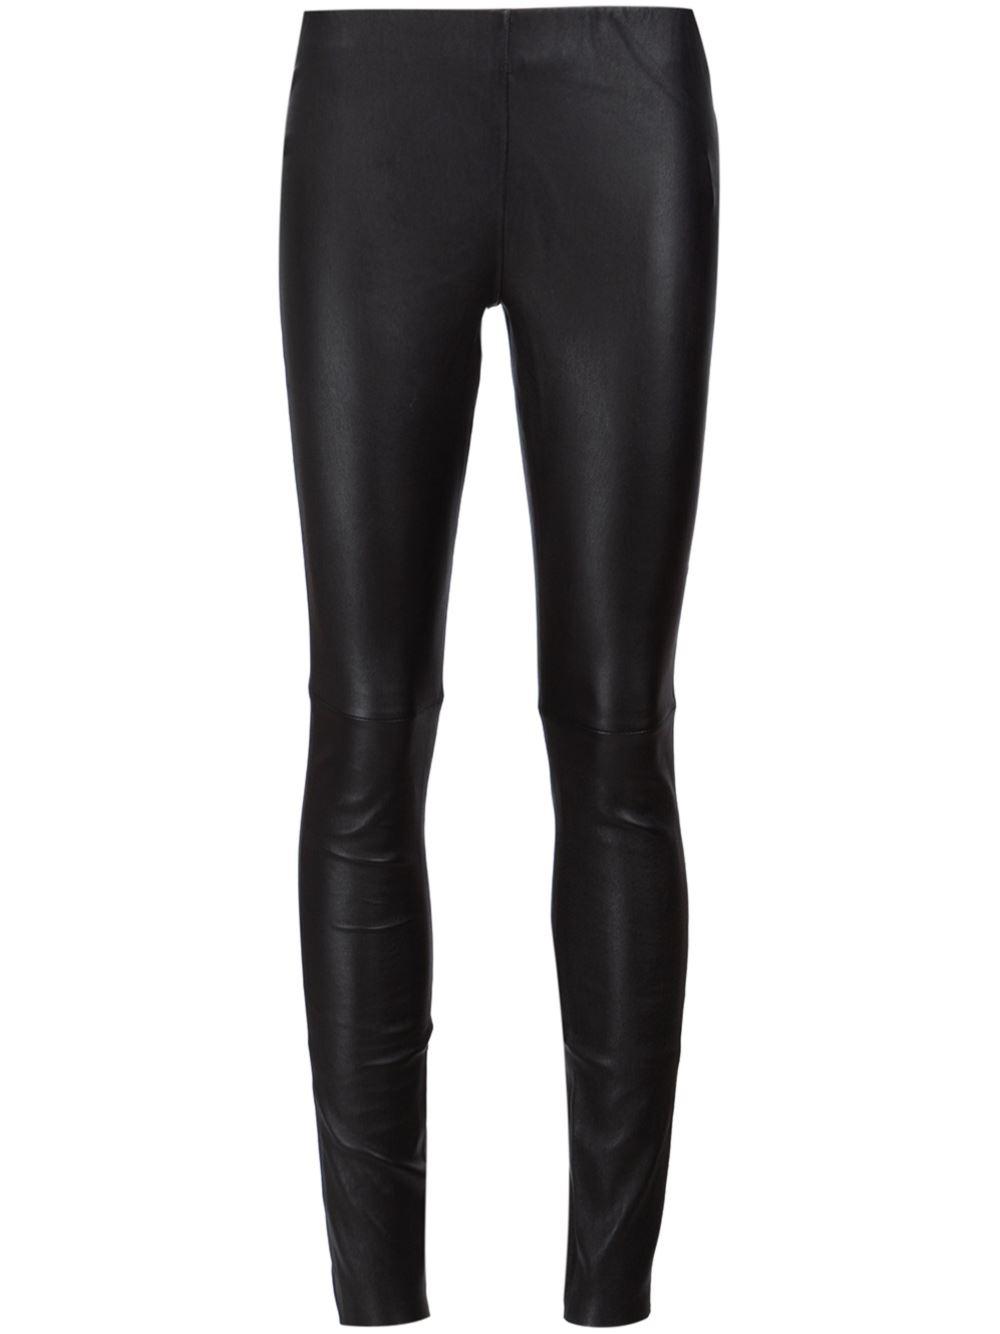 Anine Bing Black Leather Leggings - Current Season